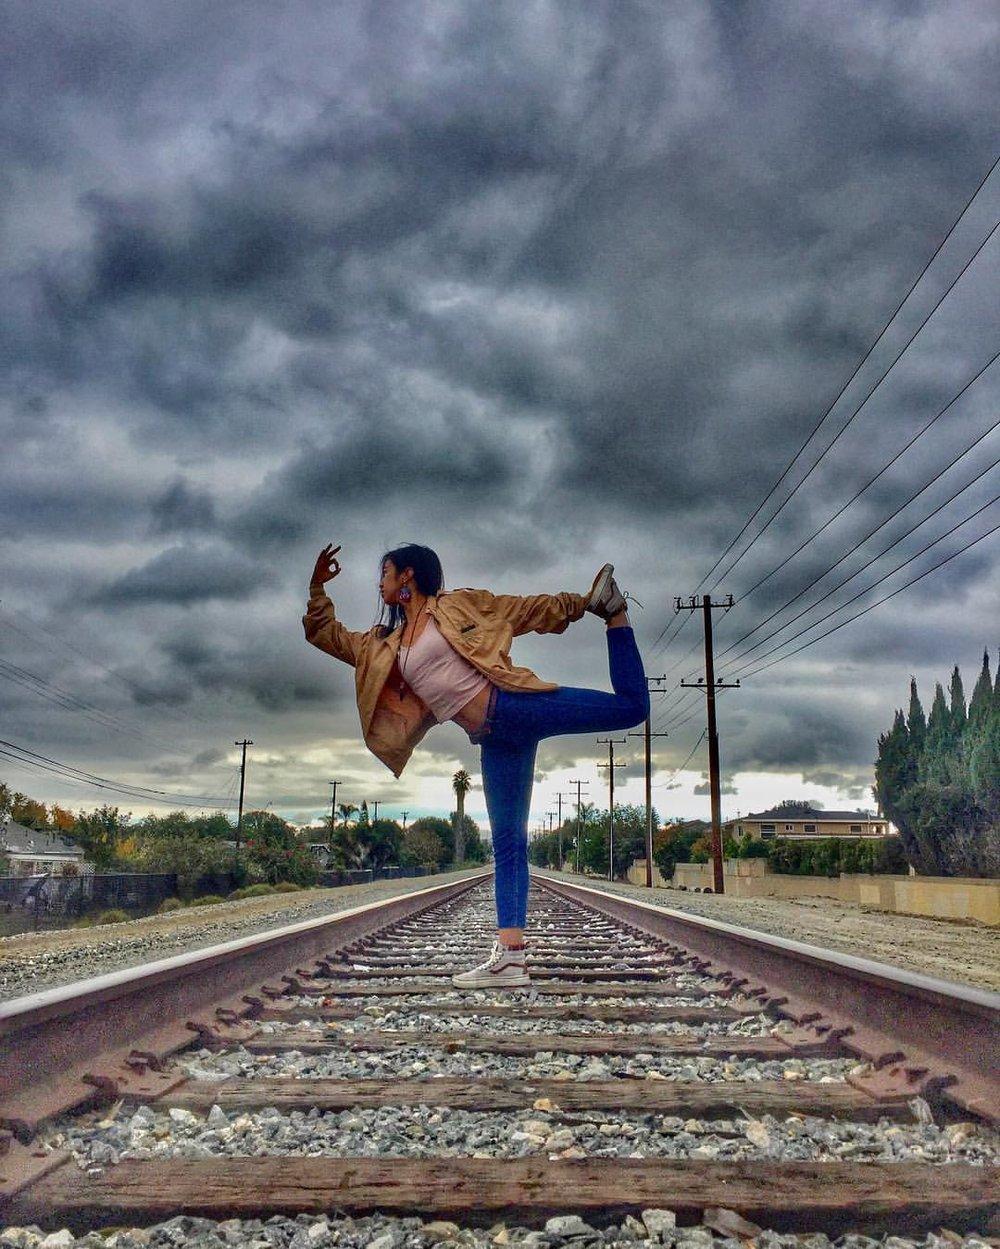 #thisiswhatayogilookslike #yogisofcolor #natarajasana (Picture taken by Ponlork Mongkoul)